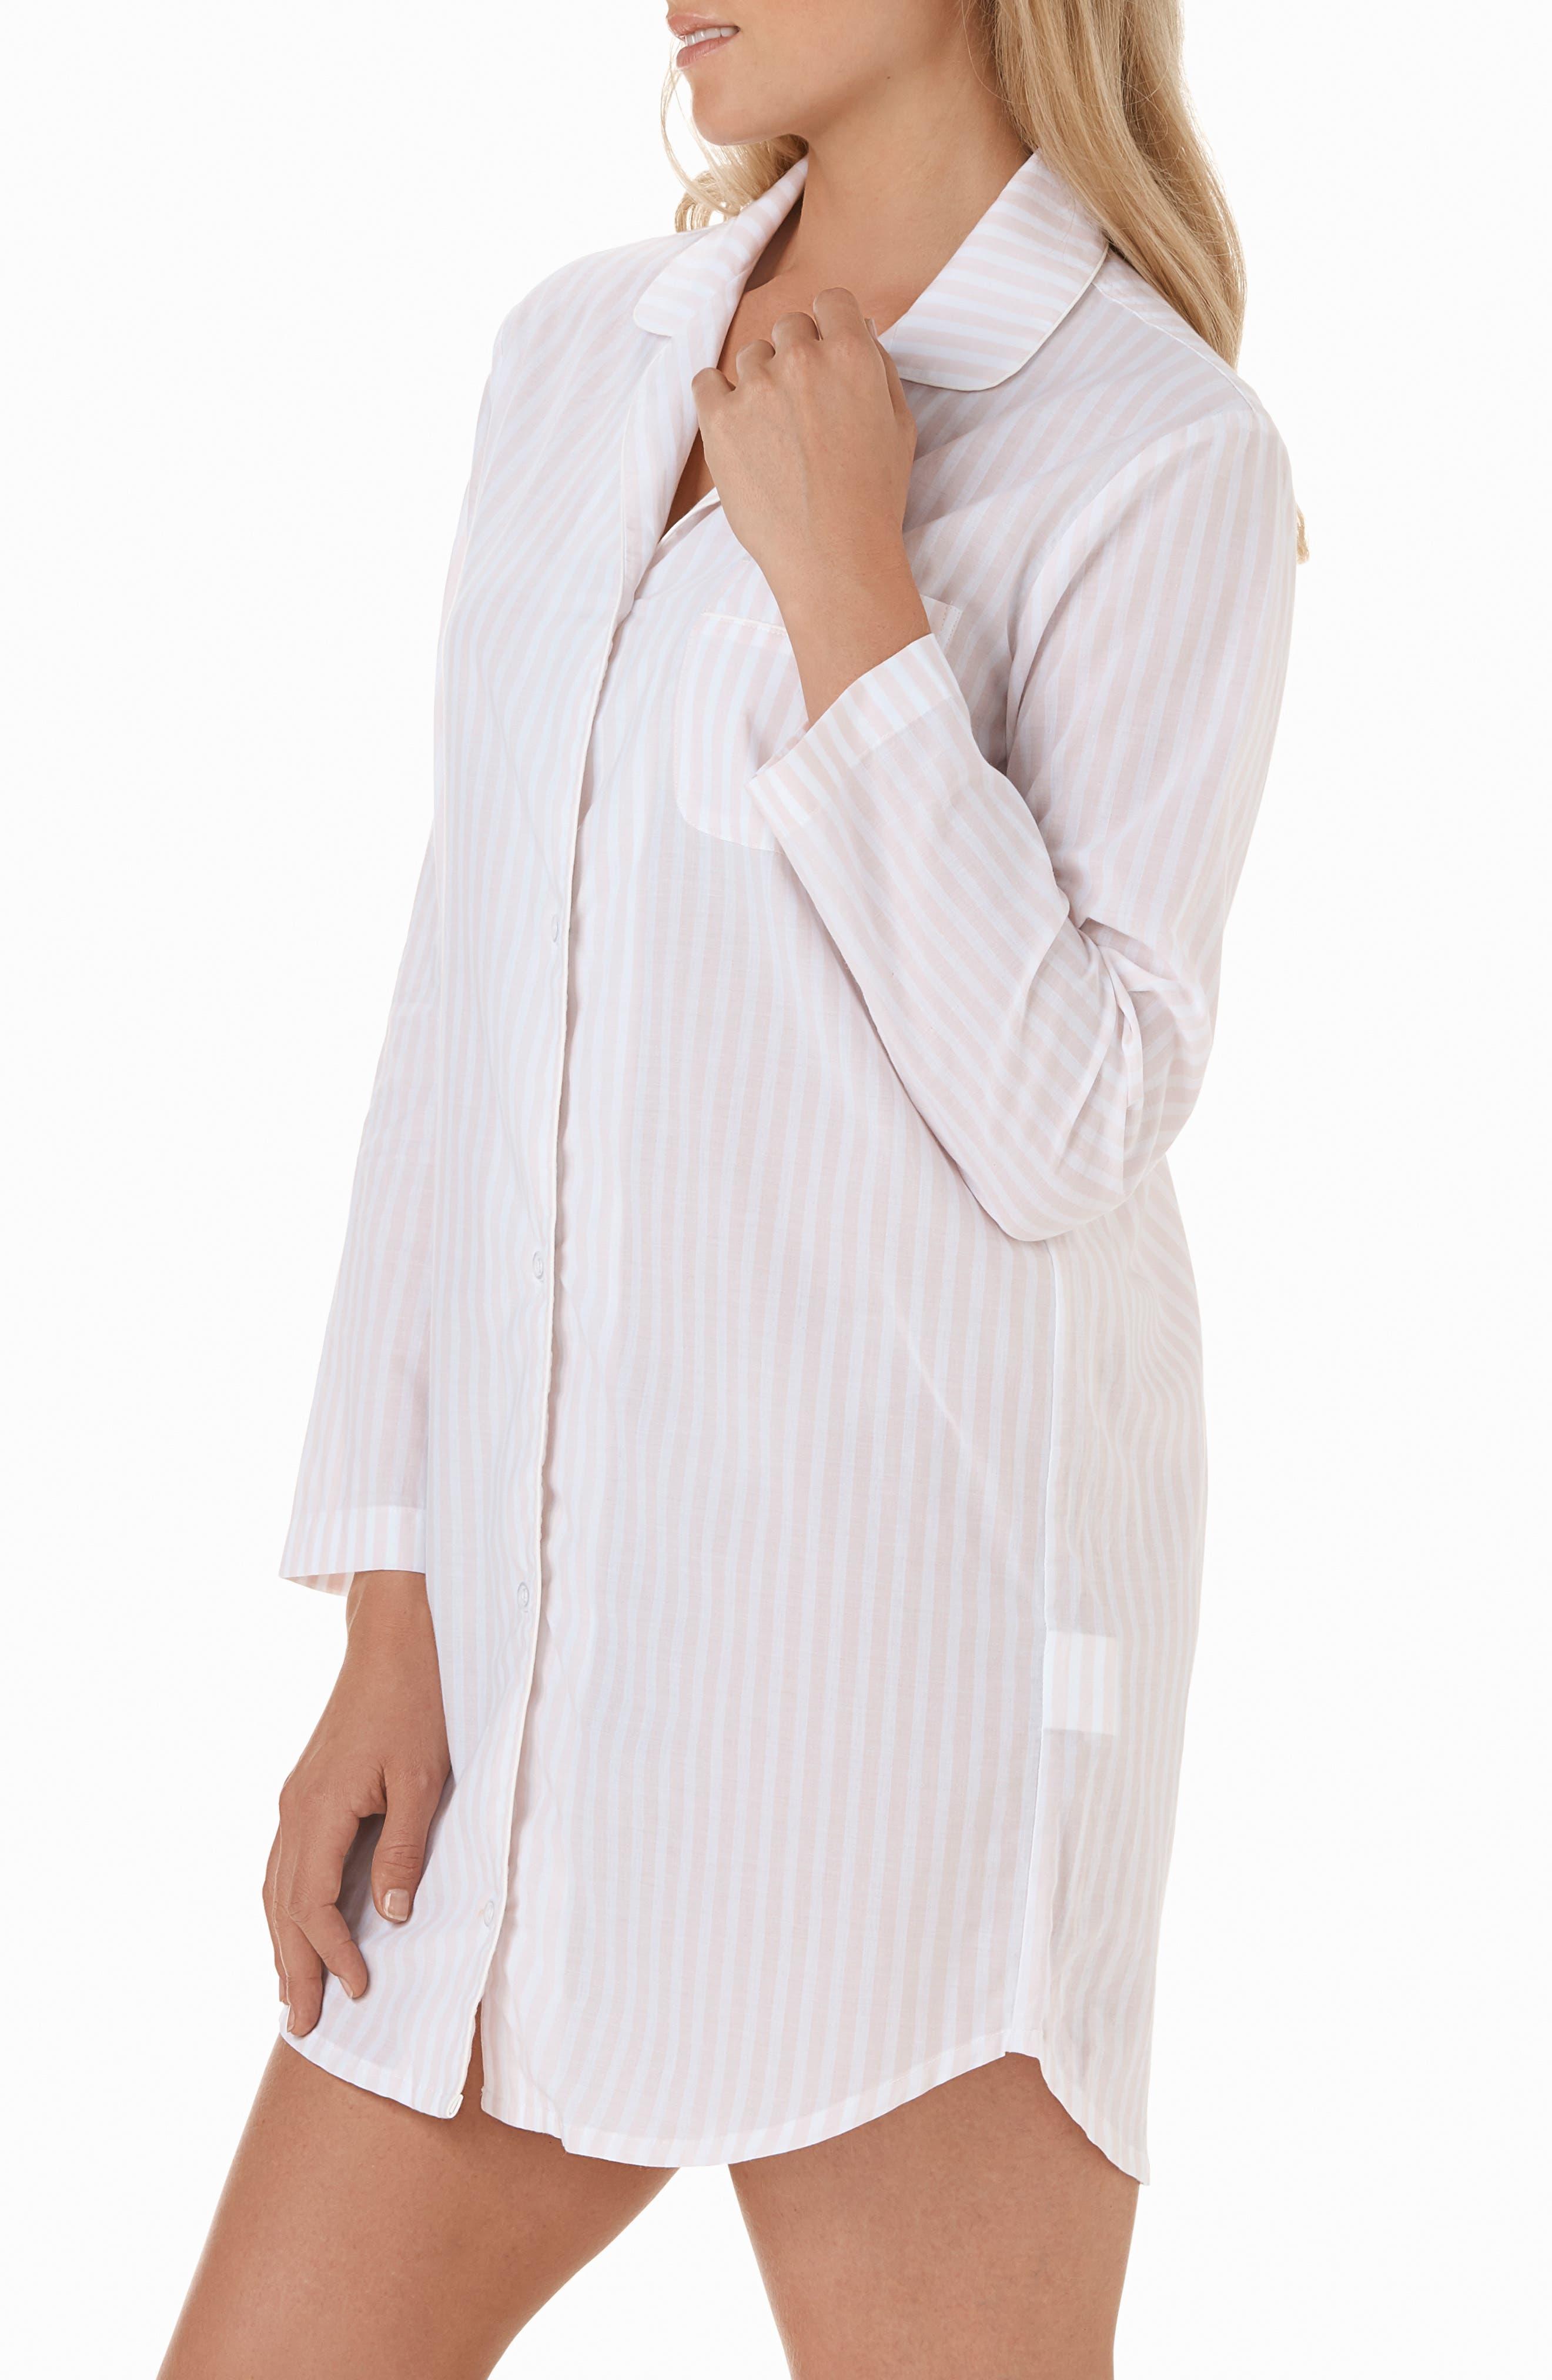 Stripe Cotton Sleep Shirt,                             Alternate thumbnail 3, color,                             PINK / WHITE STRIPE